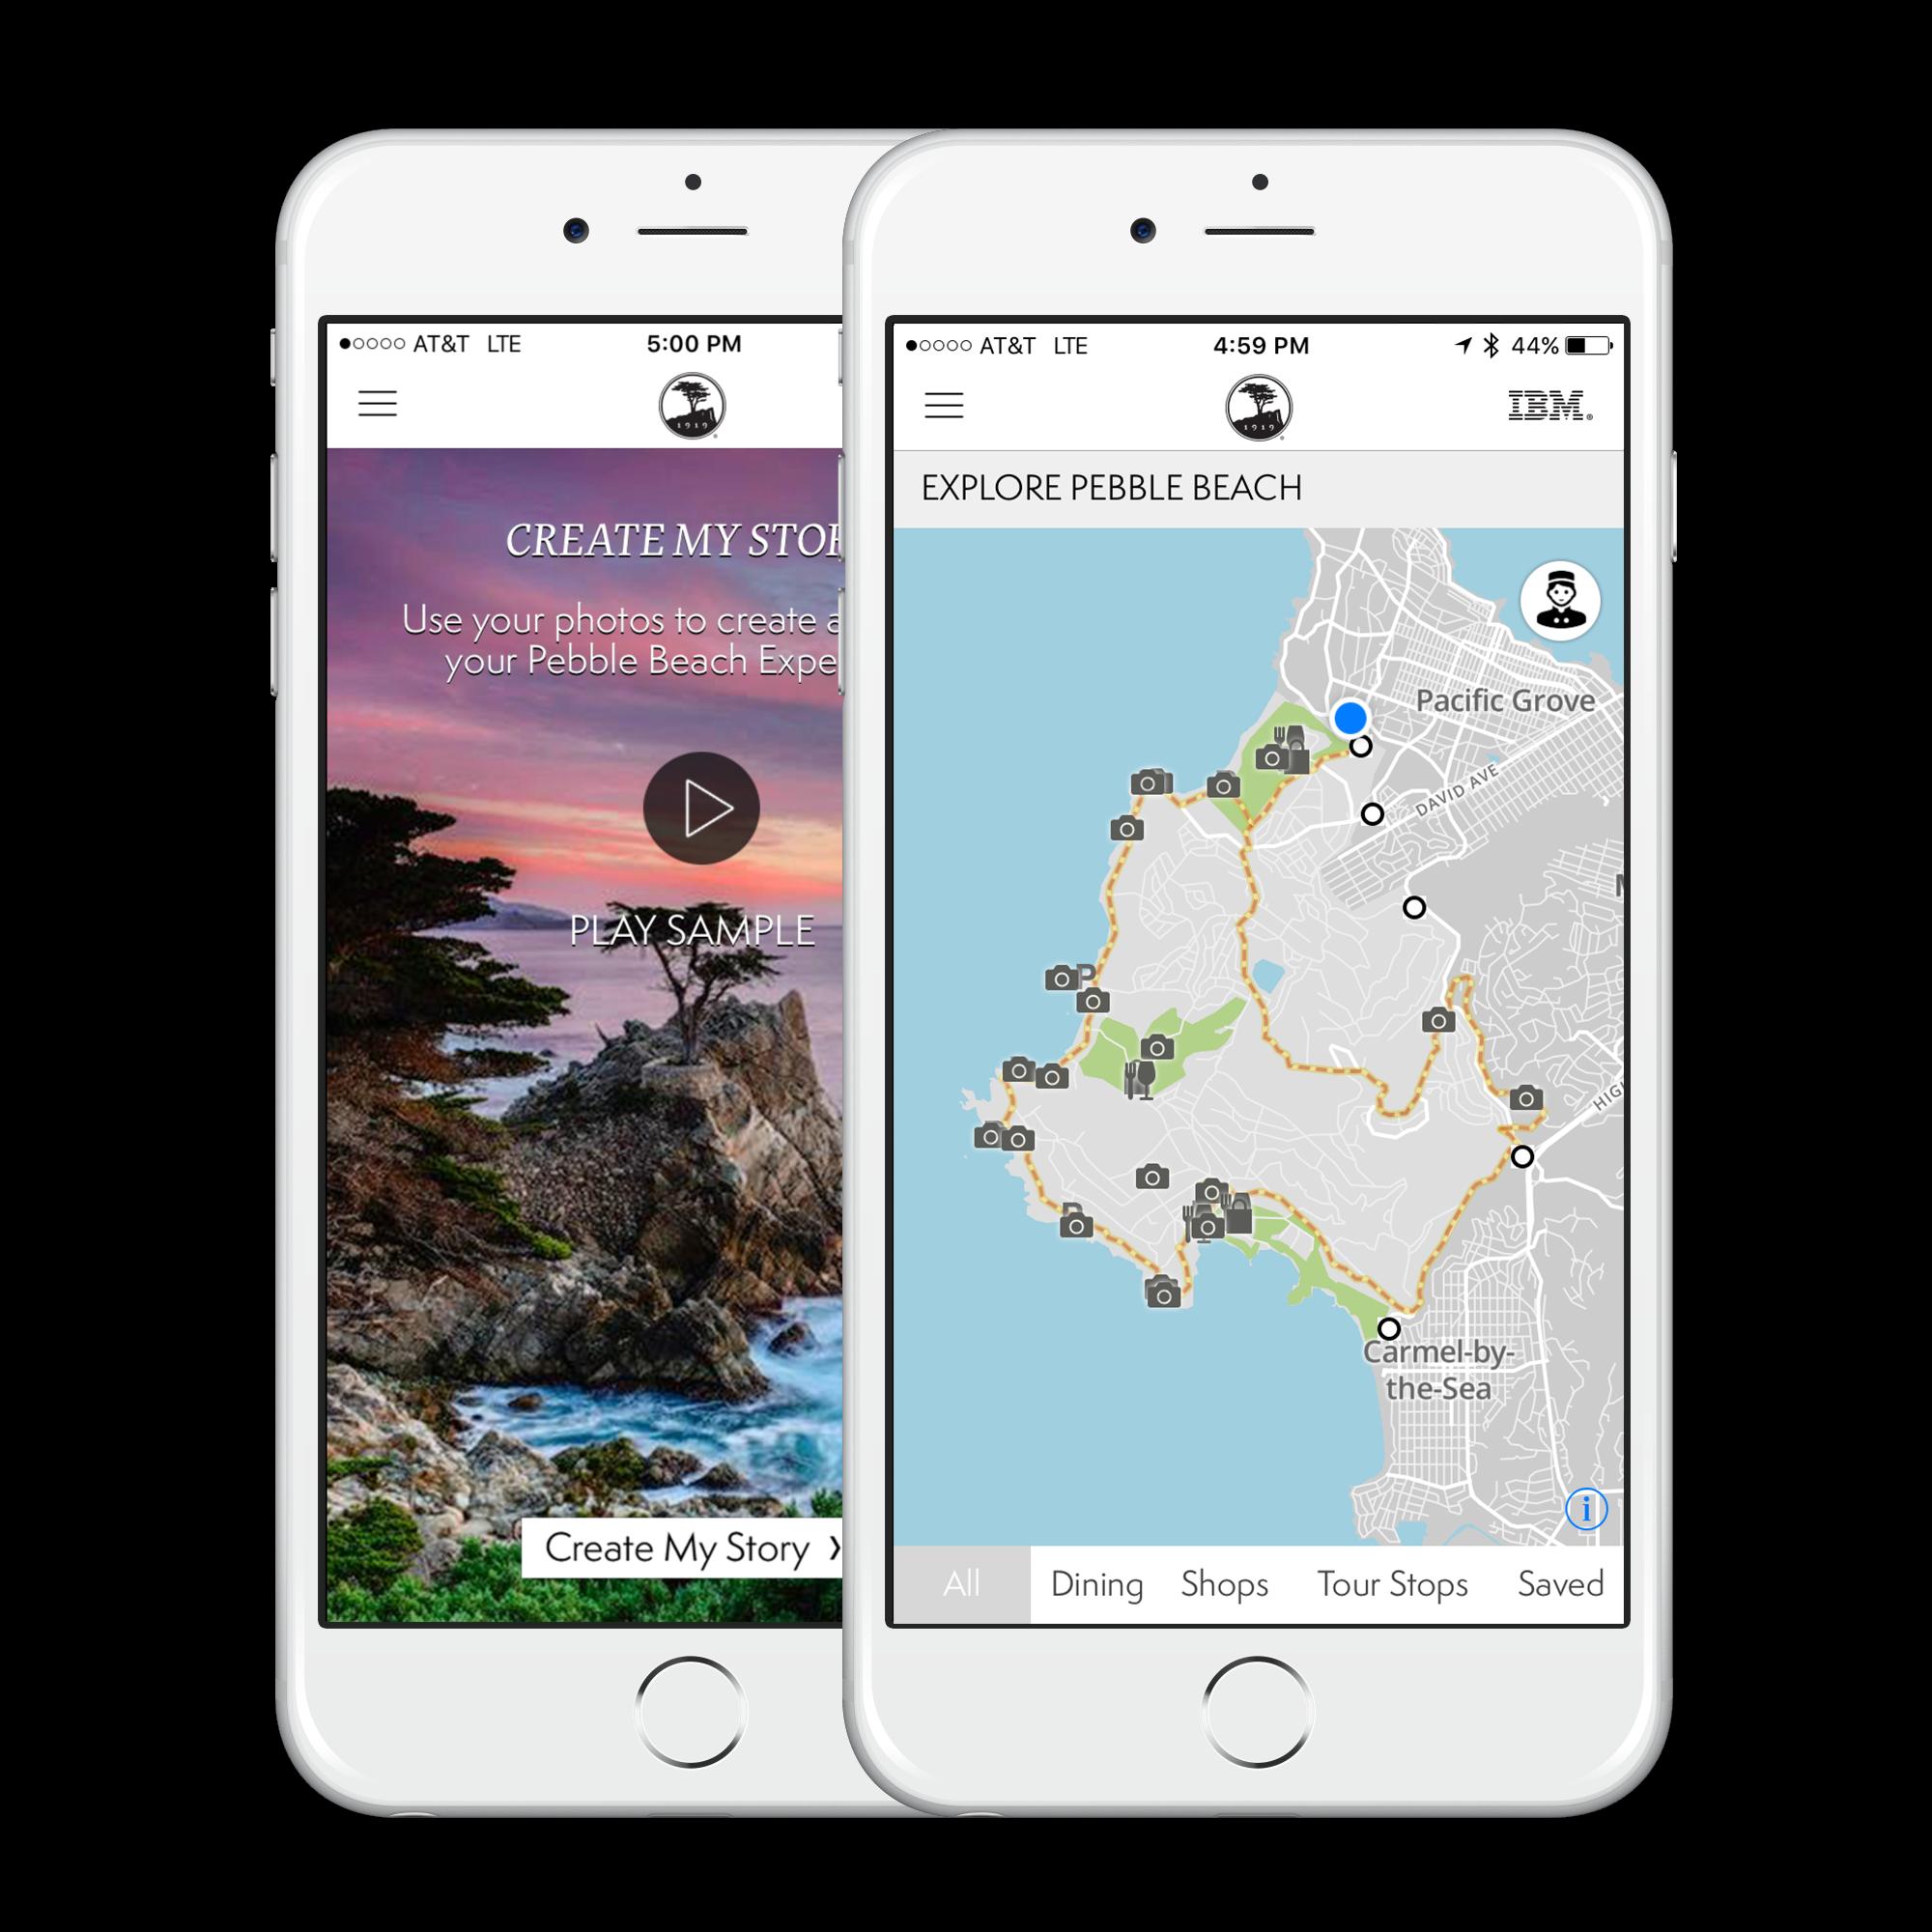 the pebble beach app on iphones